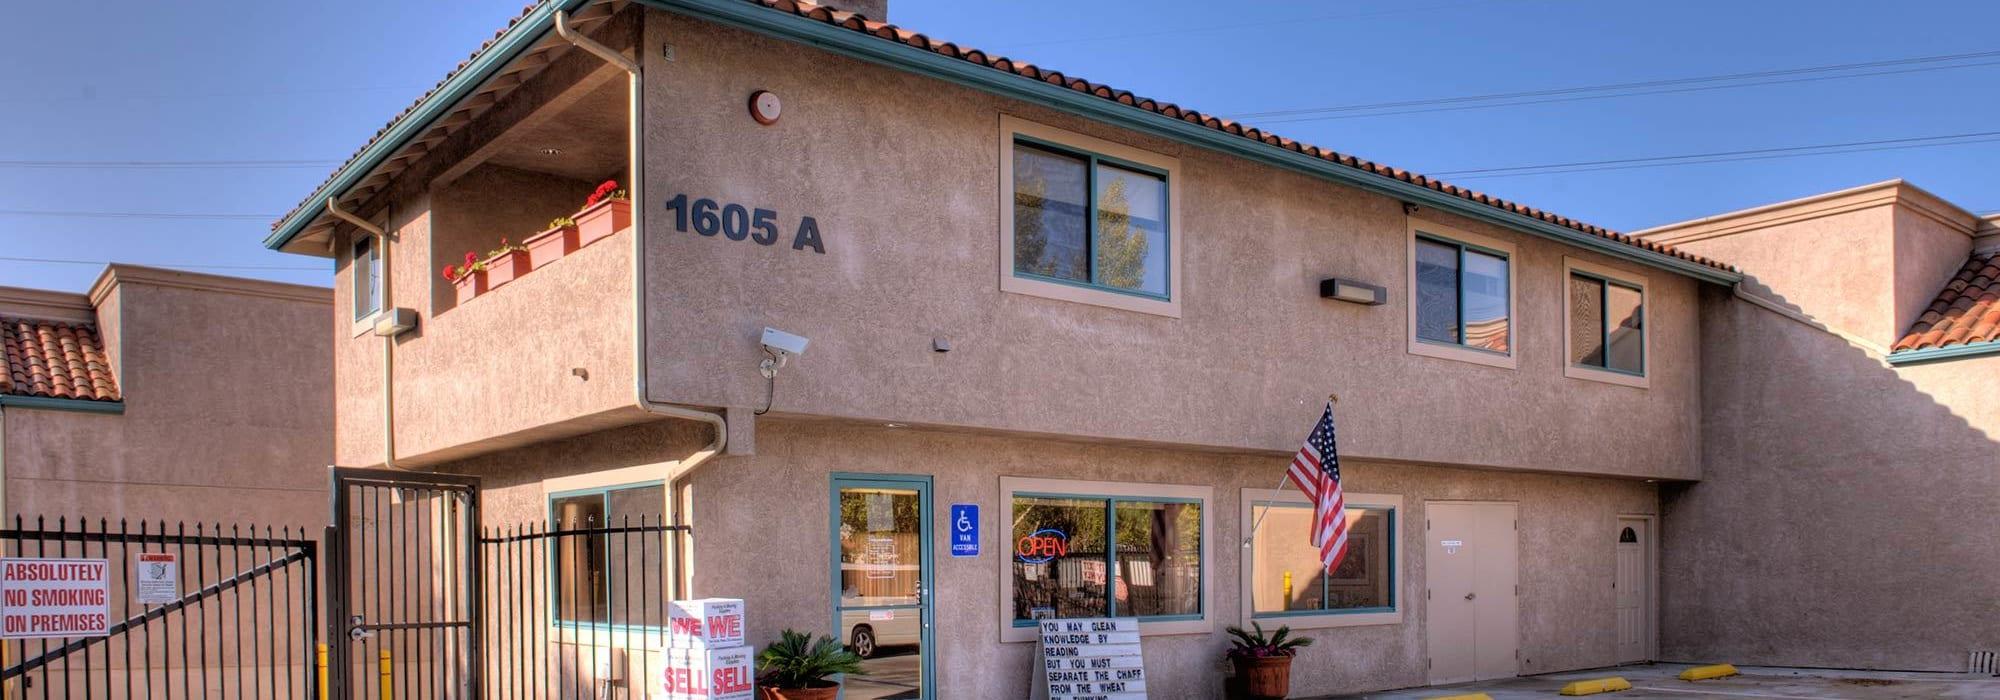 Branding on the exterior of Olivenhain Self Storage in Encinitas, California